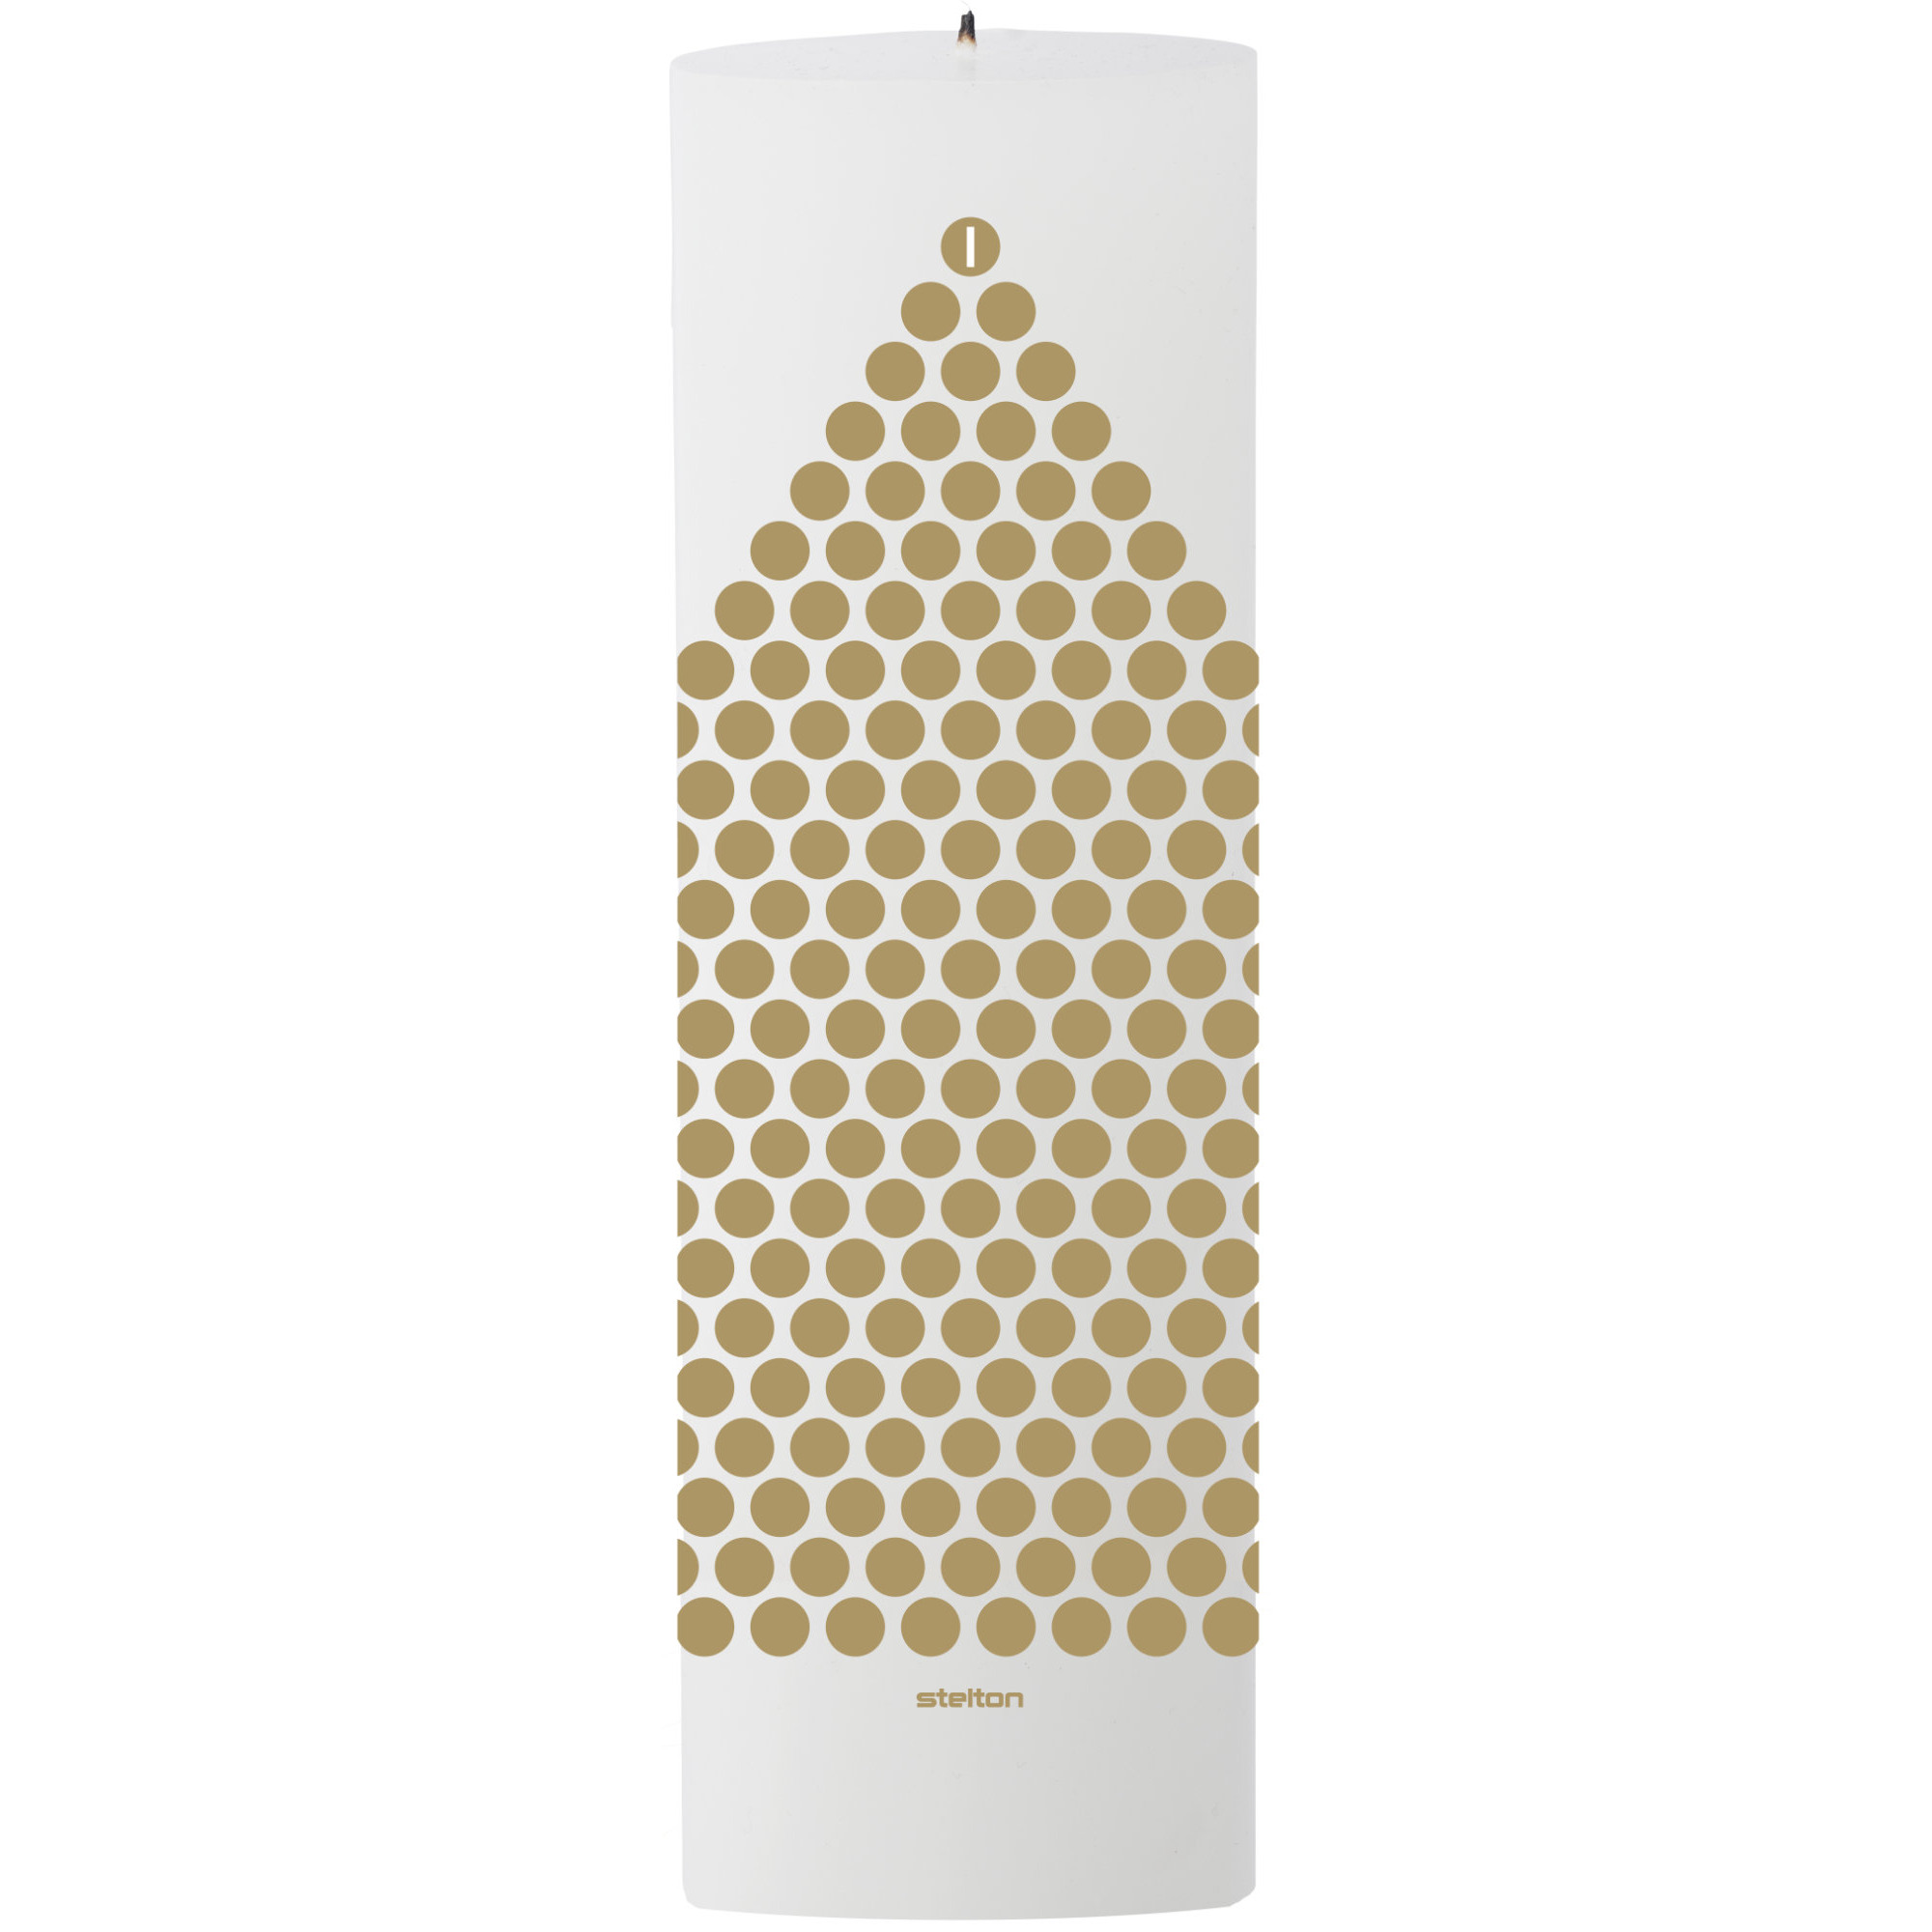 Stelton kalenderljus vit/guld